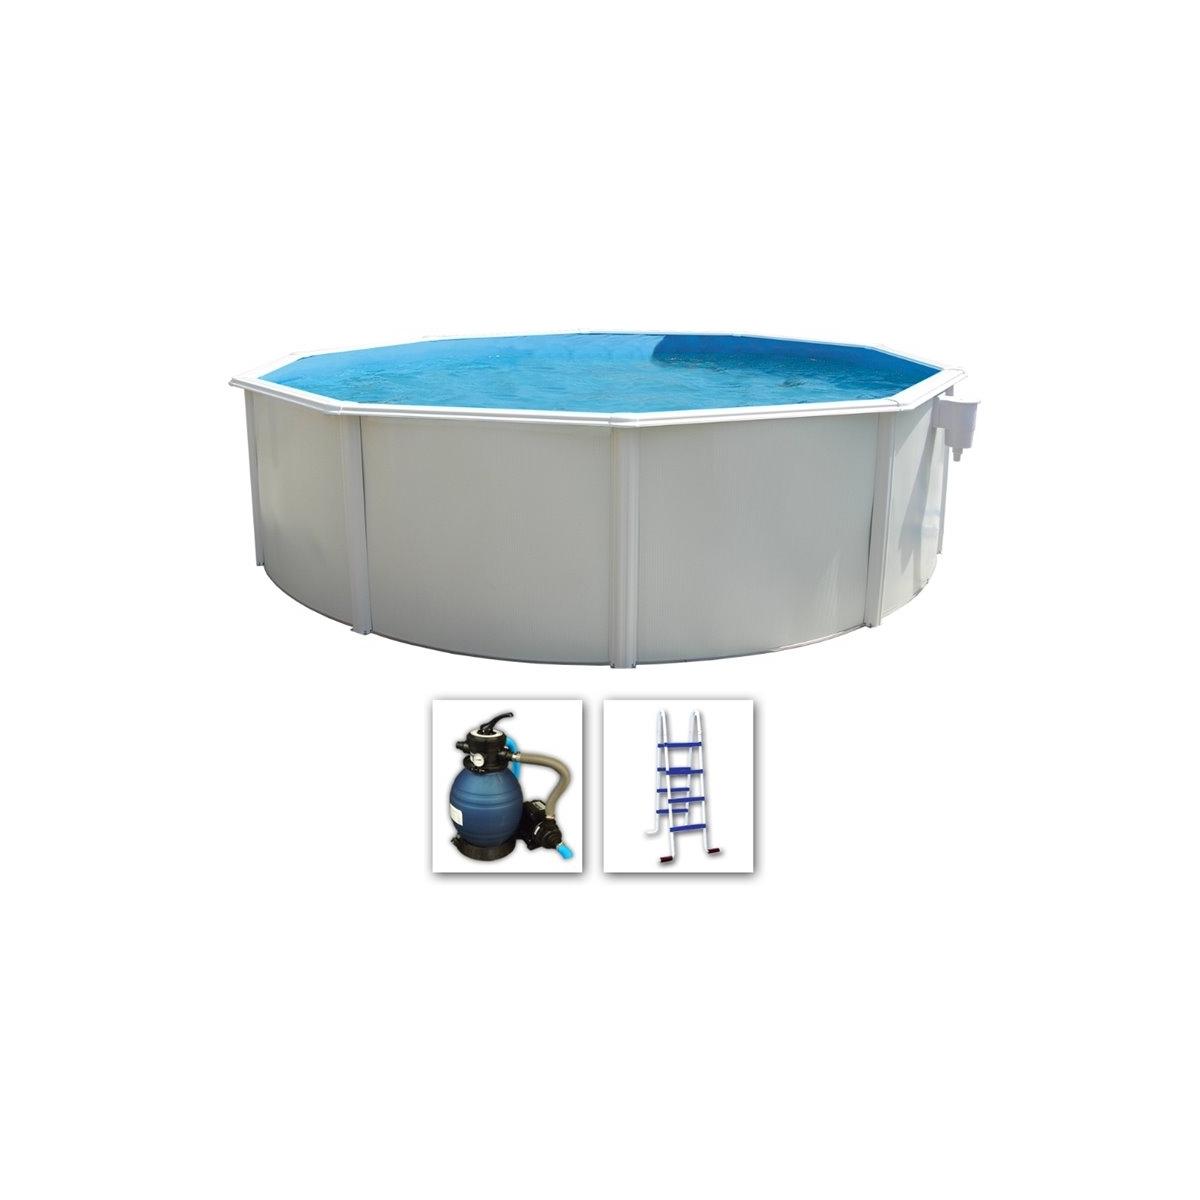 Piscina Desmontable Toi Circular 460X120 PTC504612M